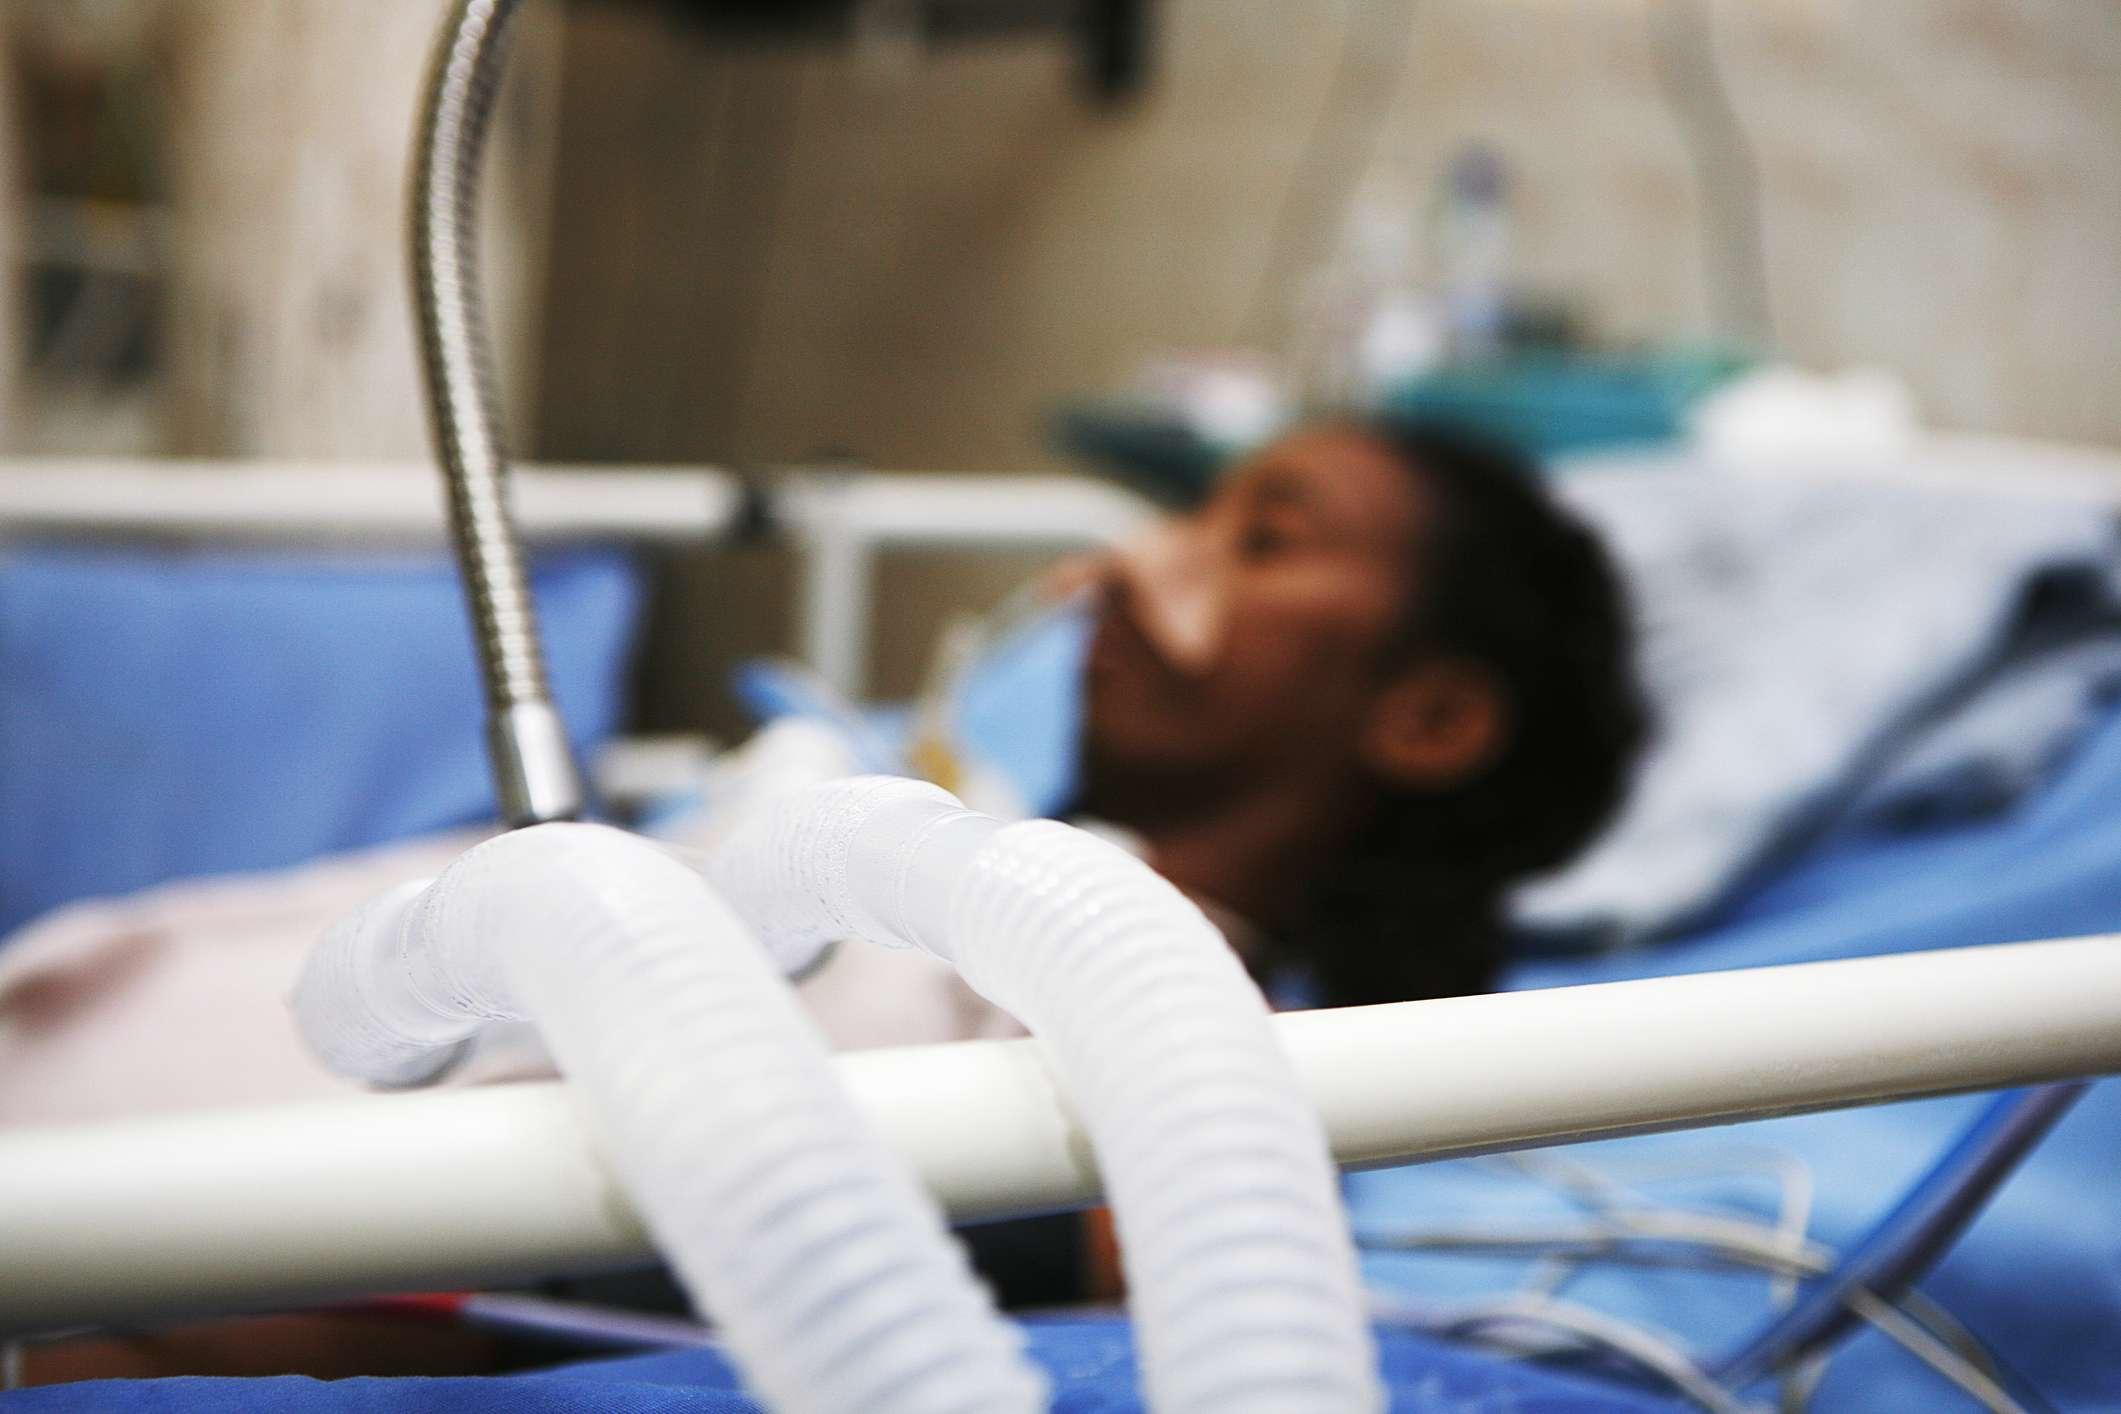 patient on ventilator in hospital bed